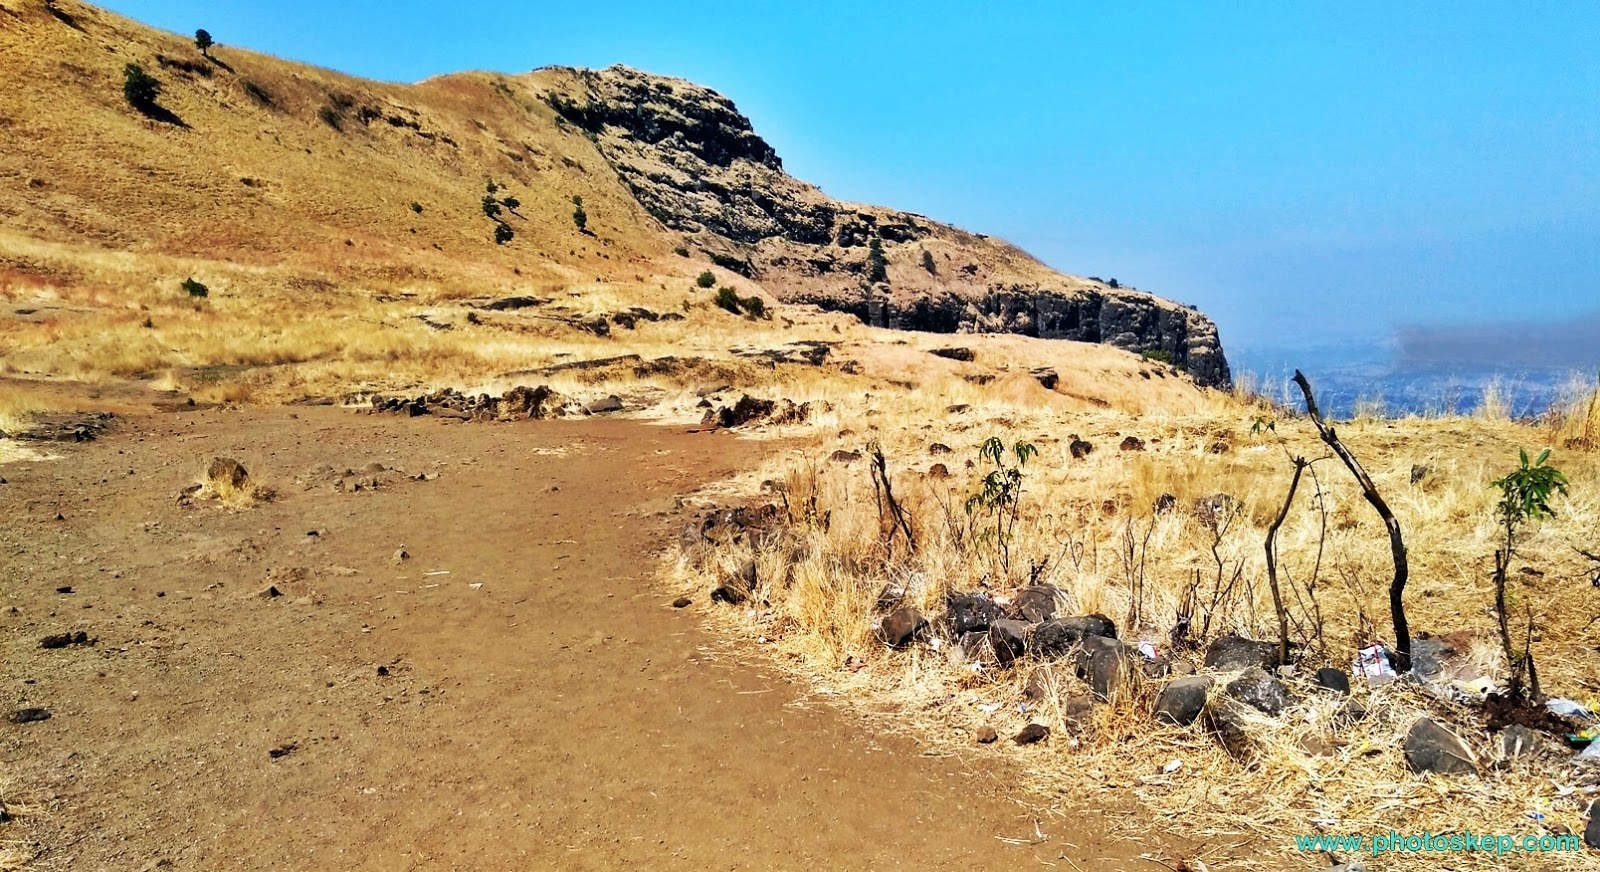 brahmagiri-parvat-trimbakeshwar-photos-pictures-images